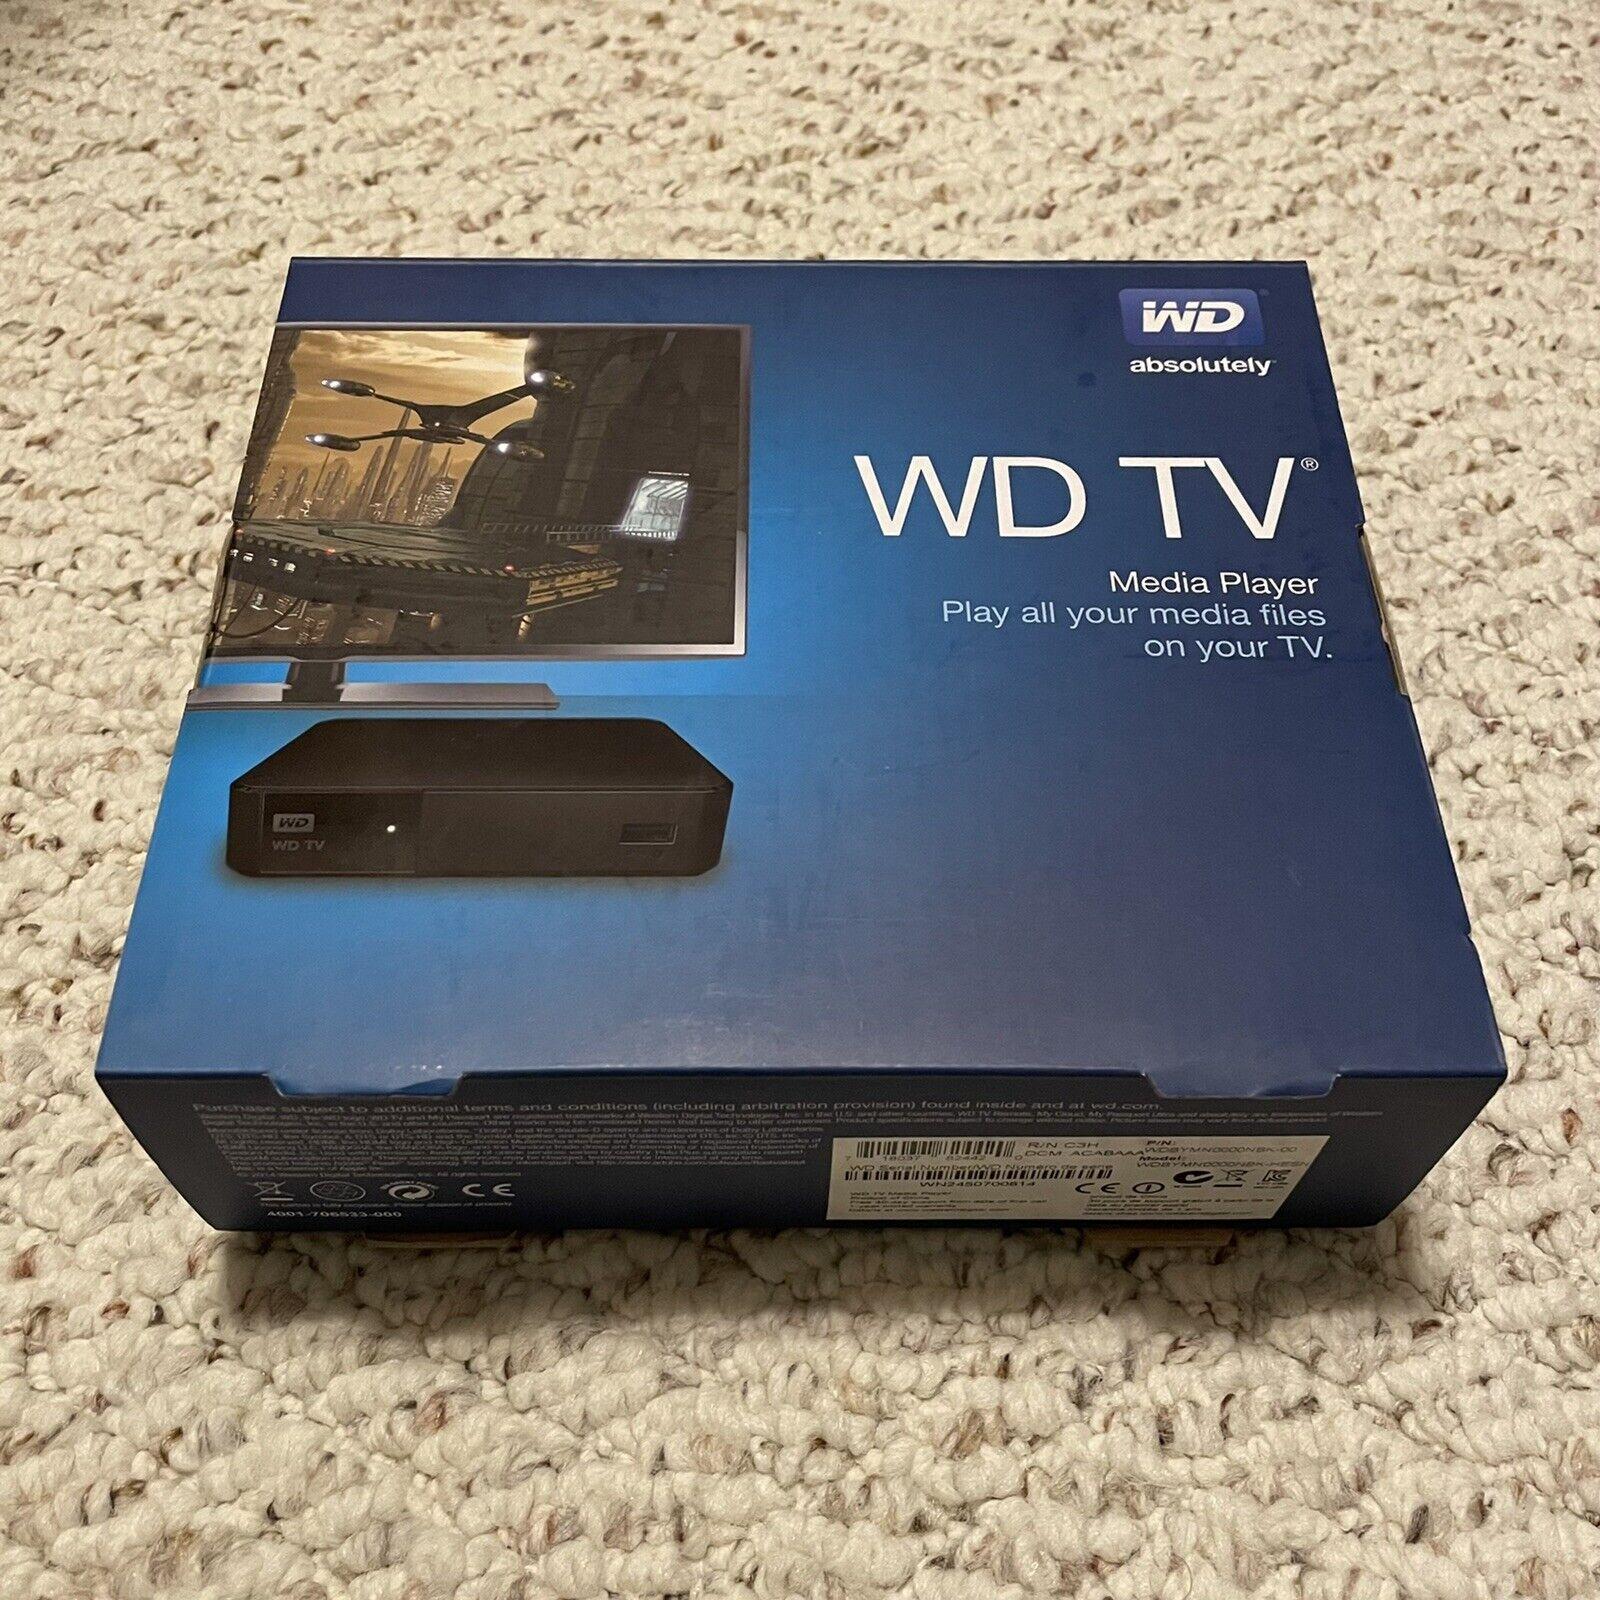 WD TV - Streaming Media Player C3H / WDBYMN0000NBK [New, Open Box] c3h media open player streaming wdbymn0000nbk